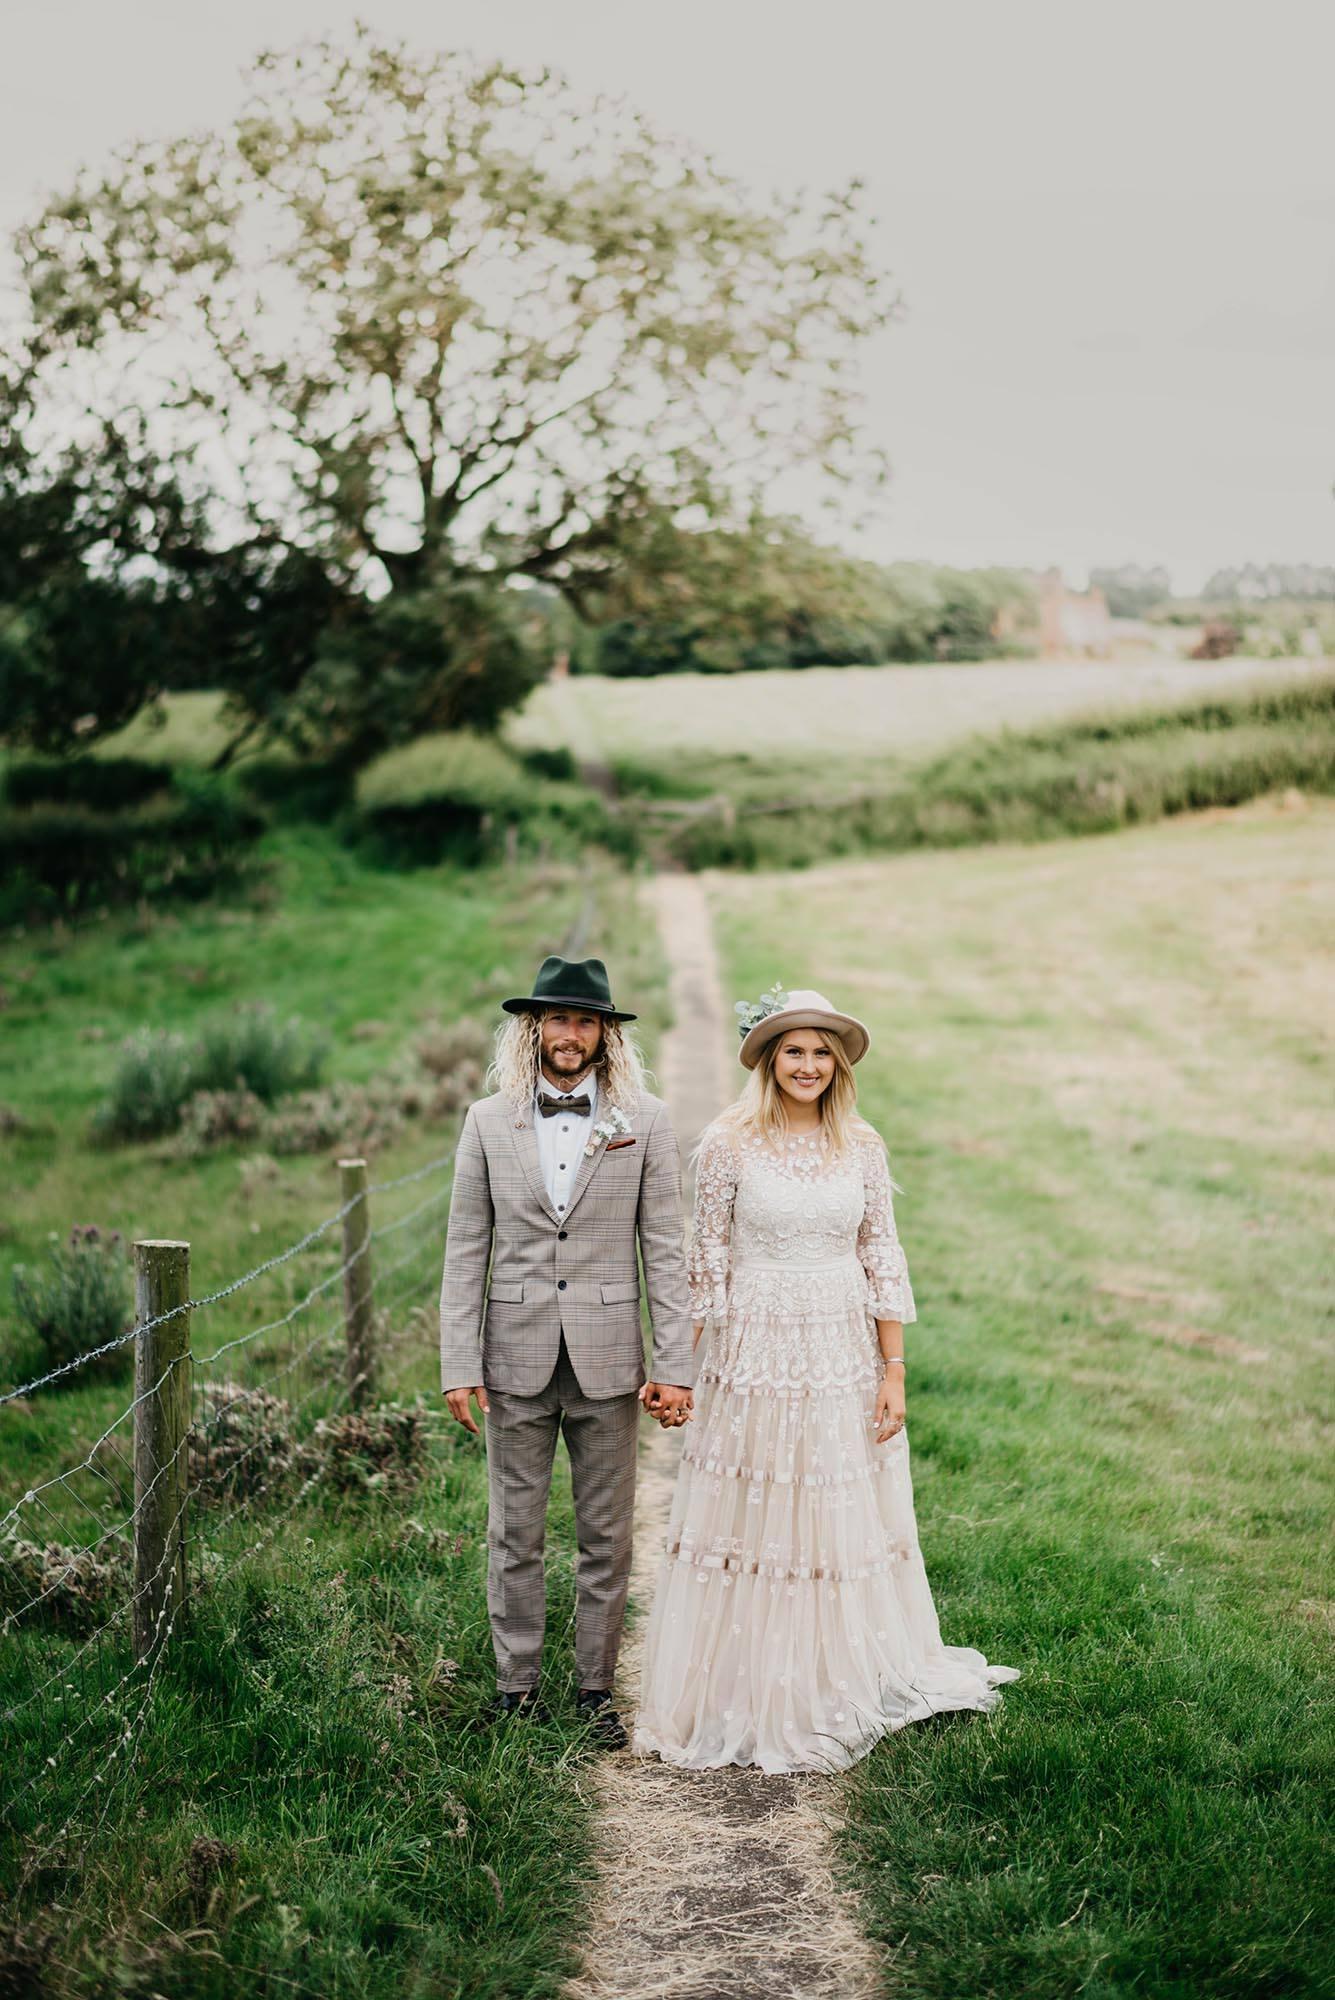 Boho countryside wedding photography - Steph and Matt